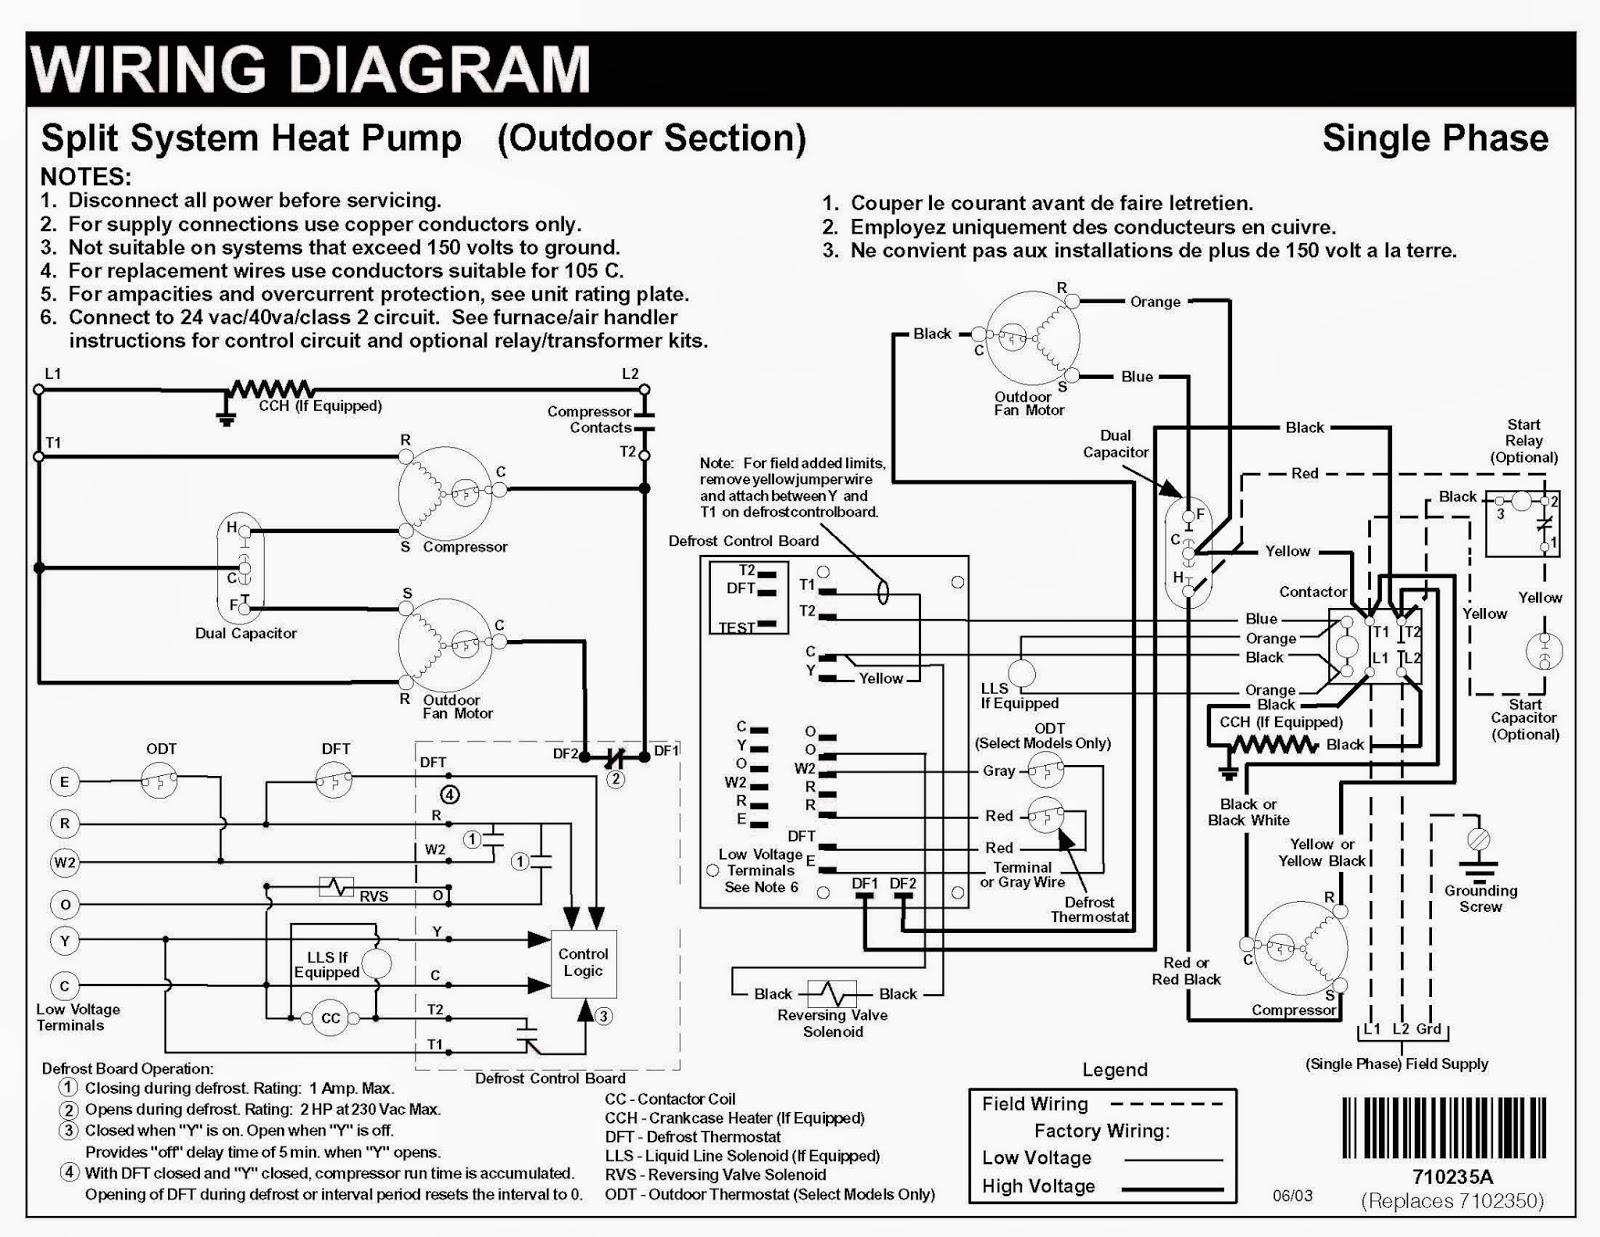 hvac wiring diagram training on hvacpdf images wiring diagram Ac Wiring Diagram Symbols hvac electrical symbols facbooik com together with hvac electrical schematic symbols merzie width= ac wiring diagram symbols